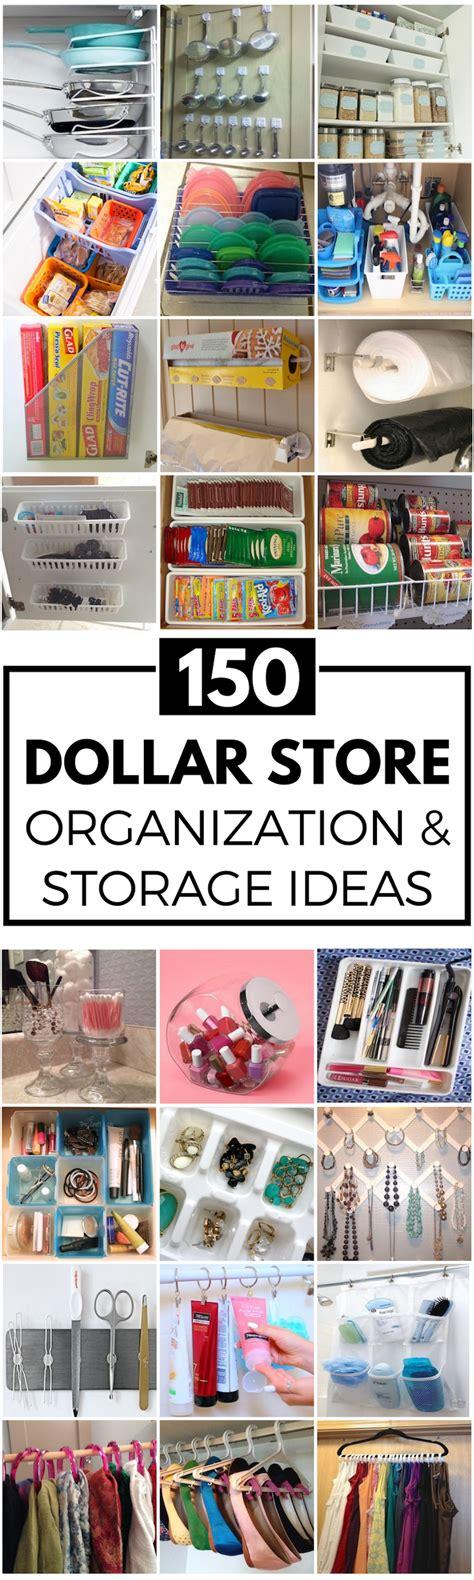 wall mount bathroom sink with cabinet 150 diy dollar store organization and storage ideas